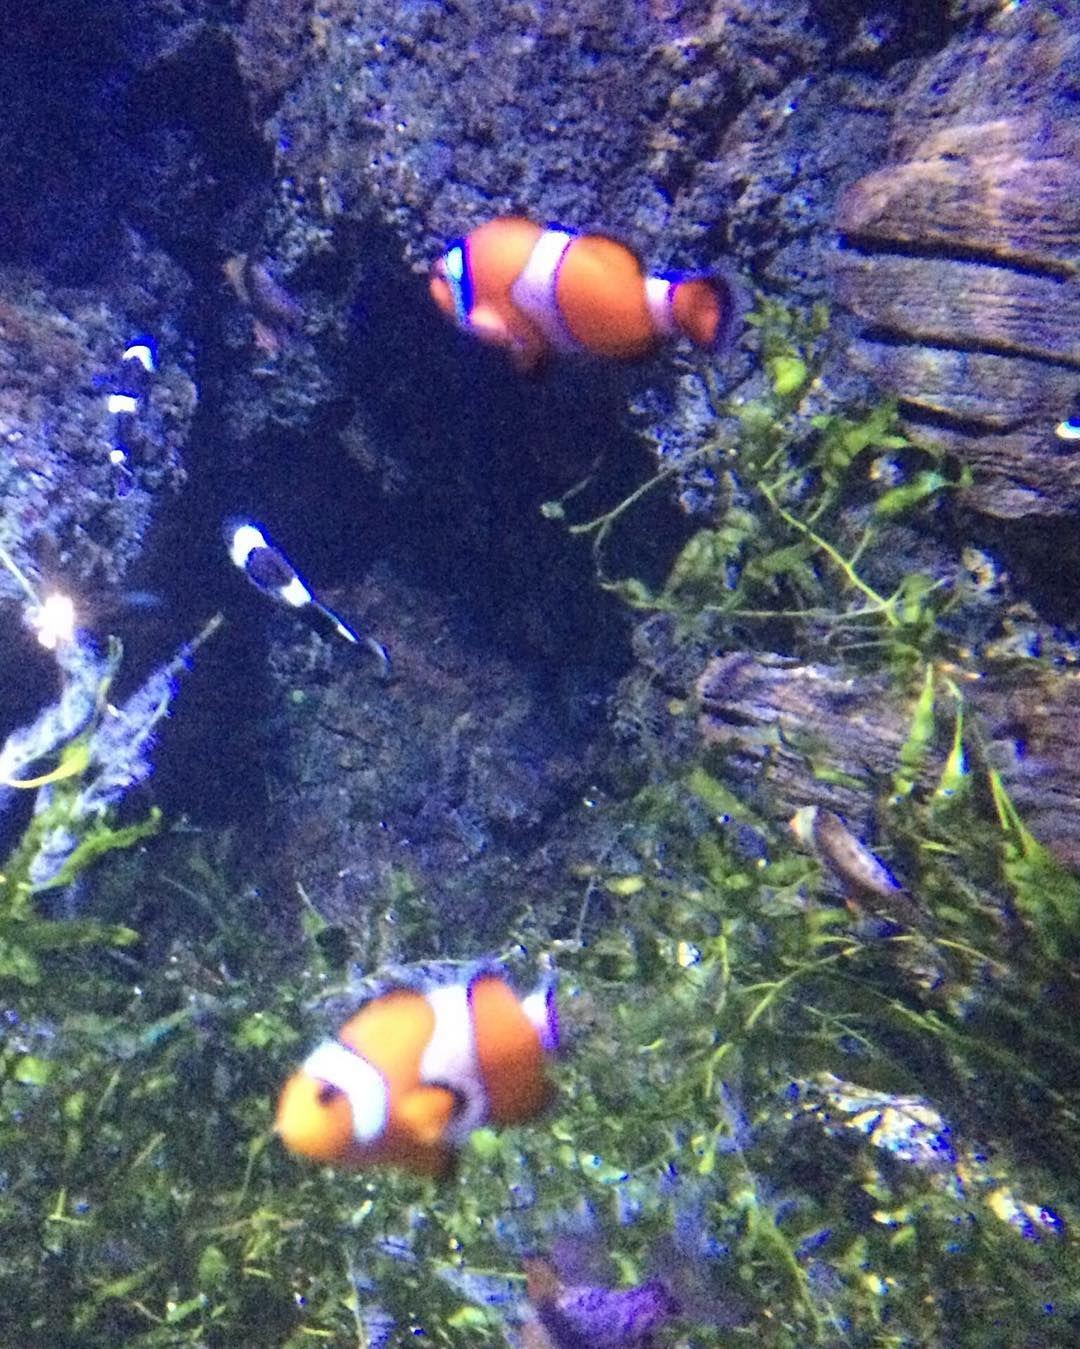 Buy fish for aquarium london - Clown Fish Clown Fish Clownfish London Aquarium Londonaquarium